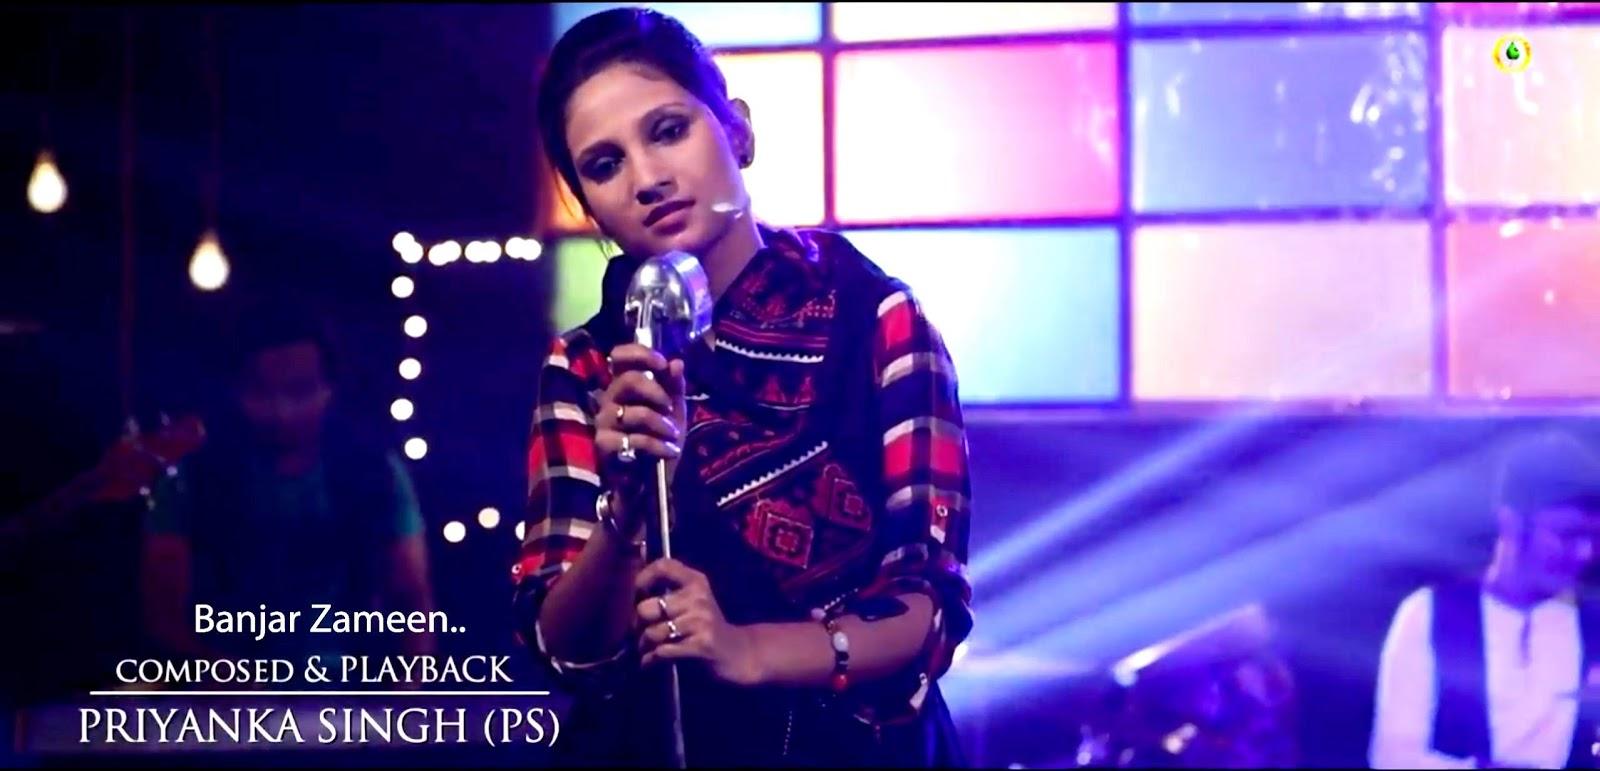 Simple Wallpaper Name Priyanka - bhojpuri-singer-priyanka-singh-hd-wallaper-5-top-10-bhojpuri  You Should Have_689450.jpg